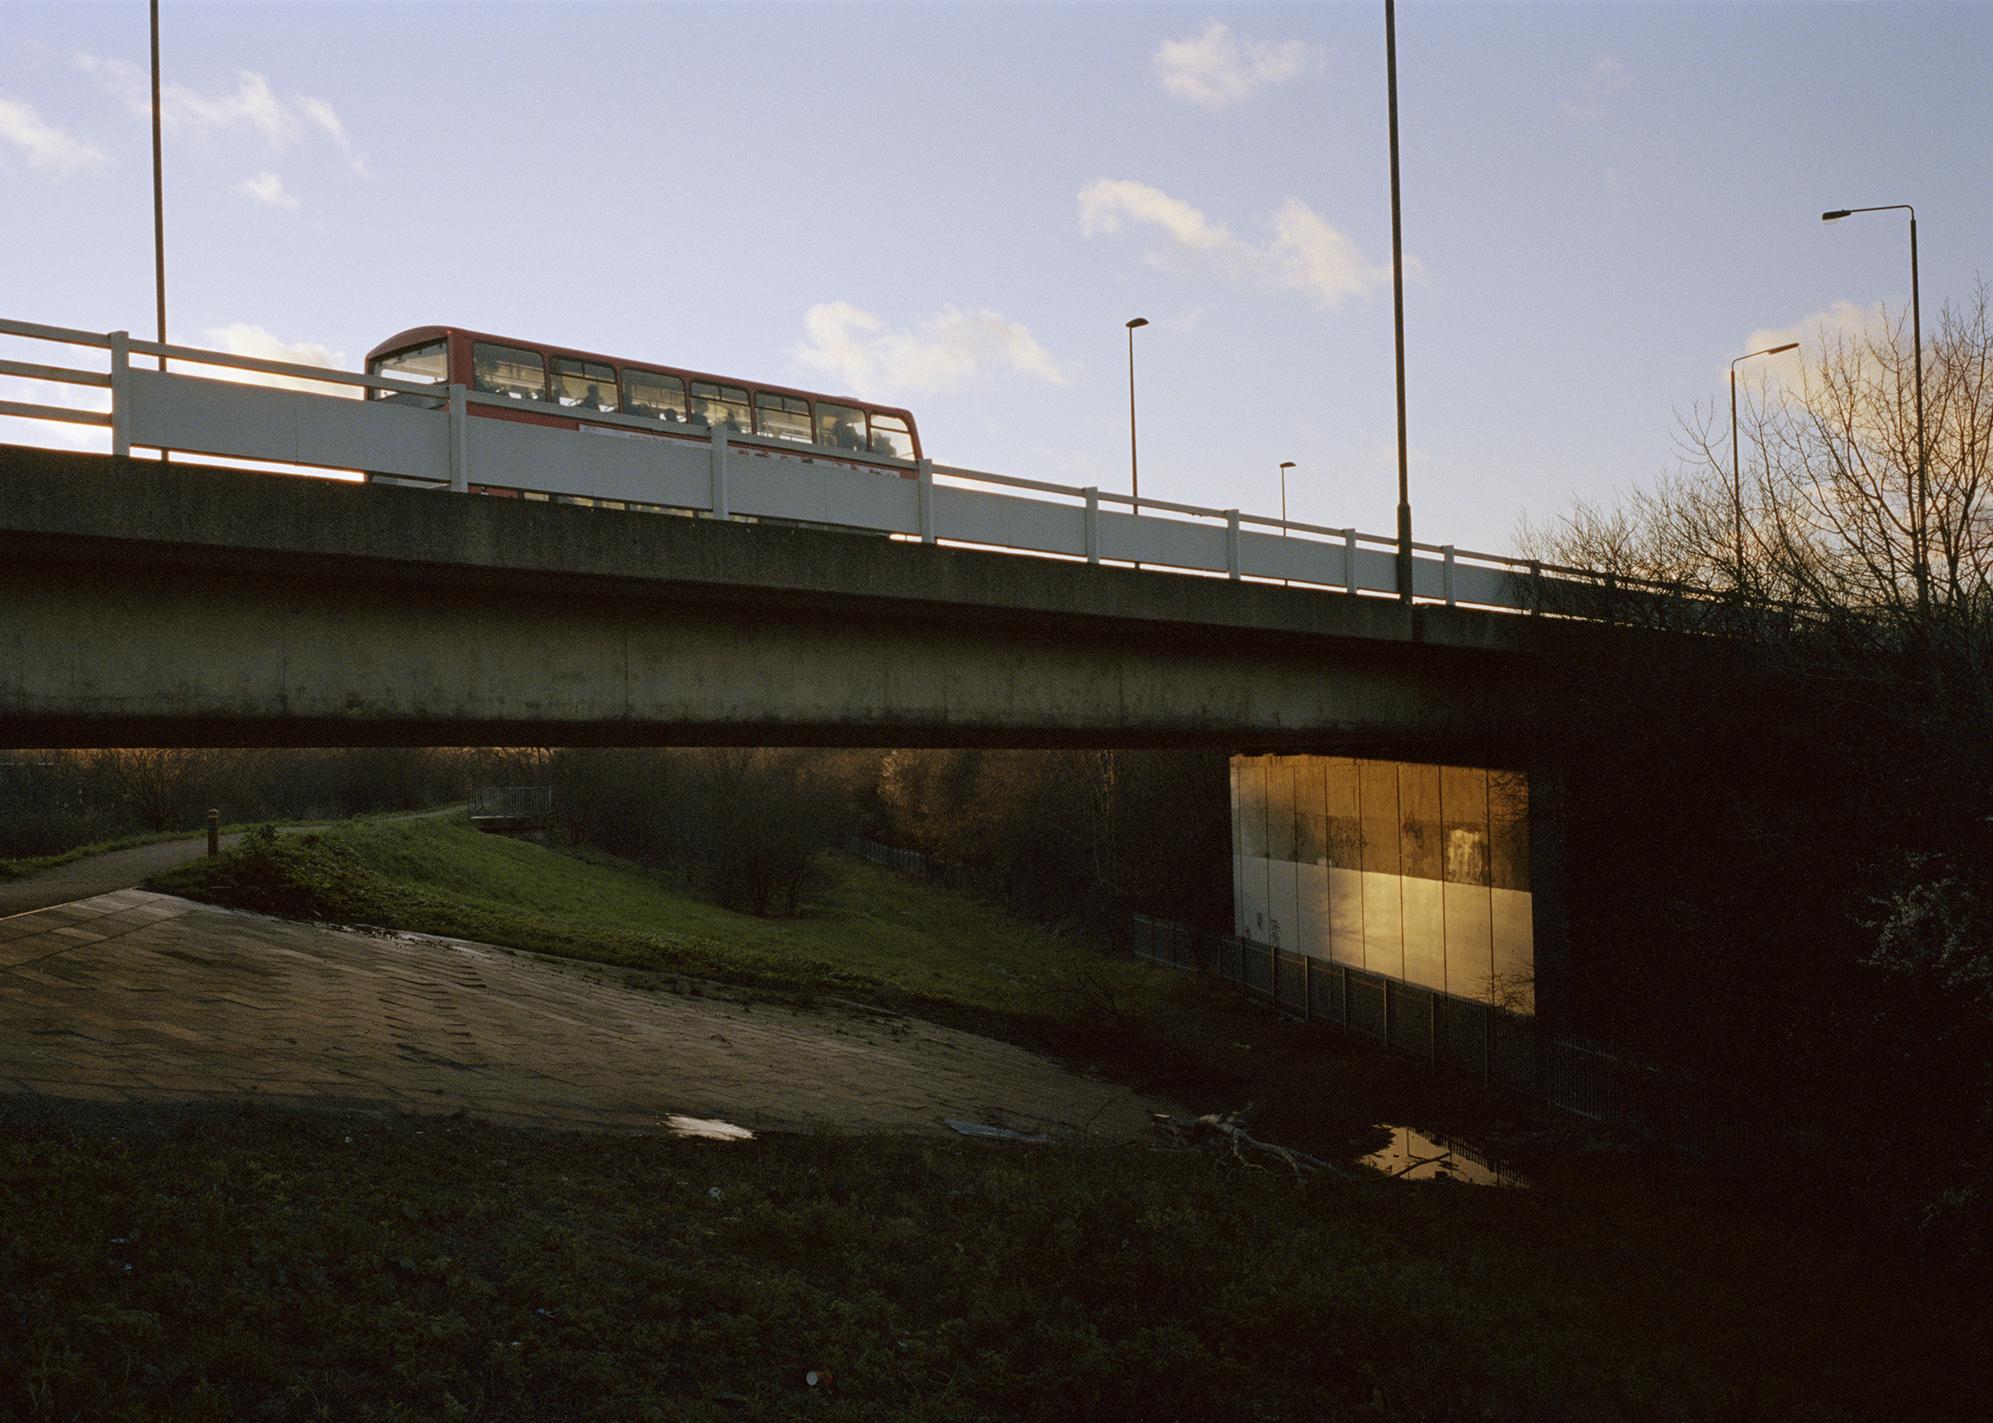 9_bus_on_bridge.jpg